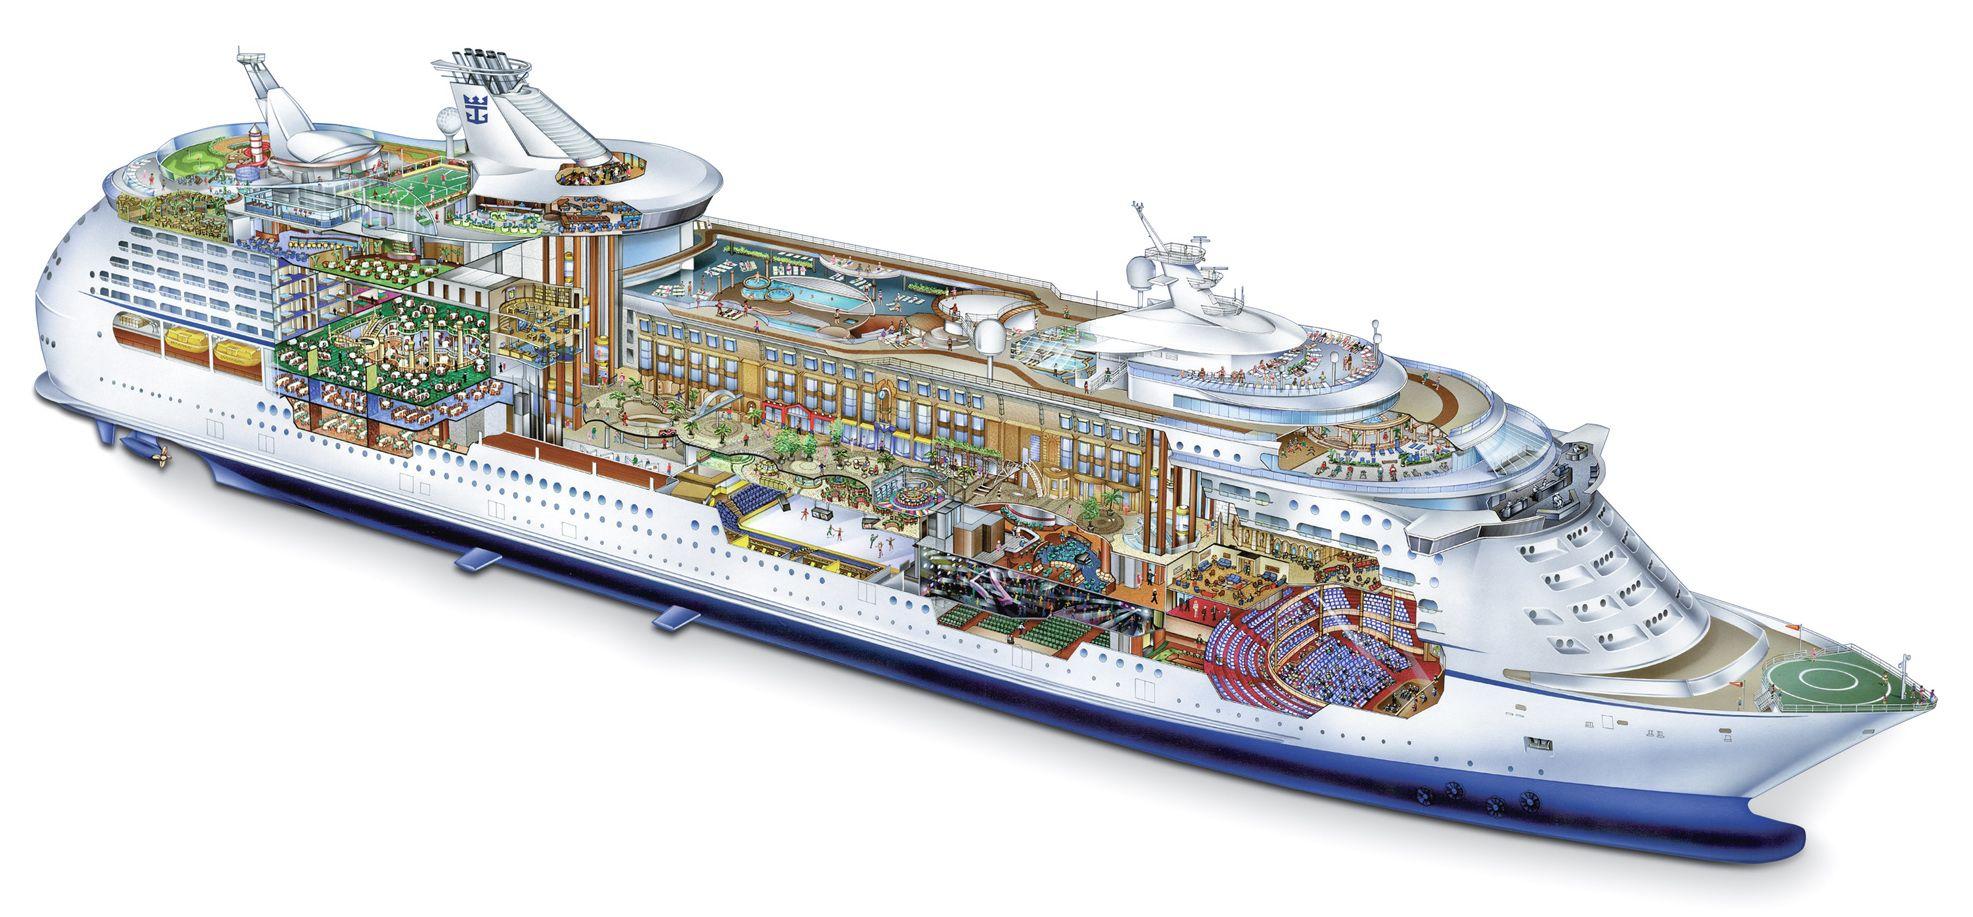 Royal Caribbean - Voyager of the Seas | CruiseShips | Pinterest